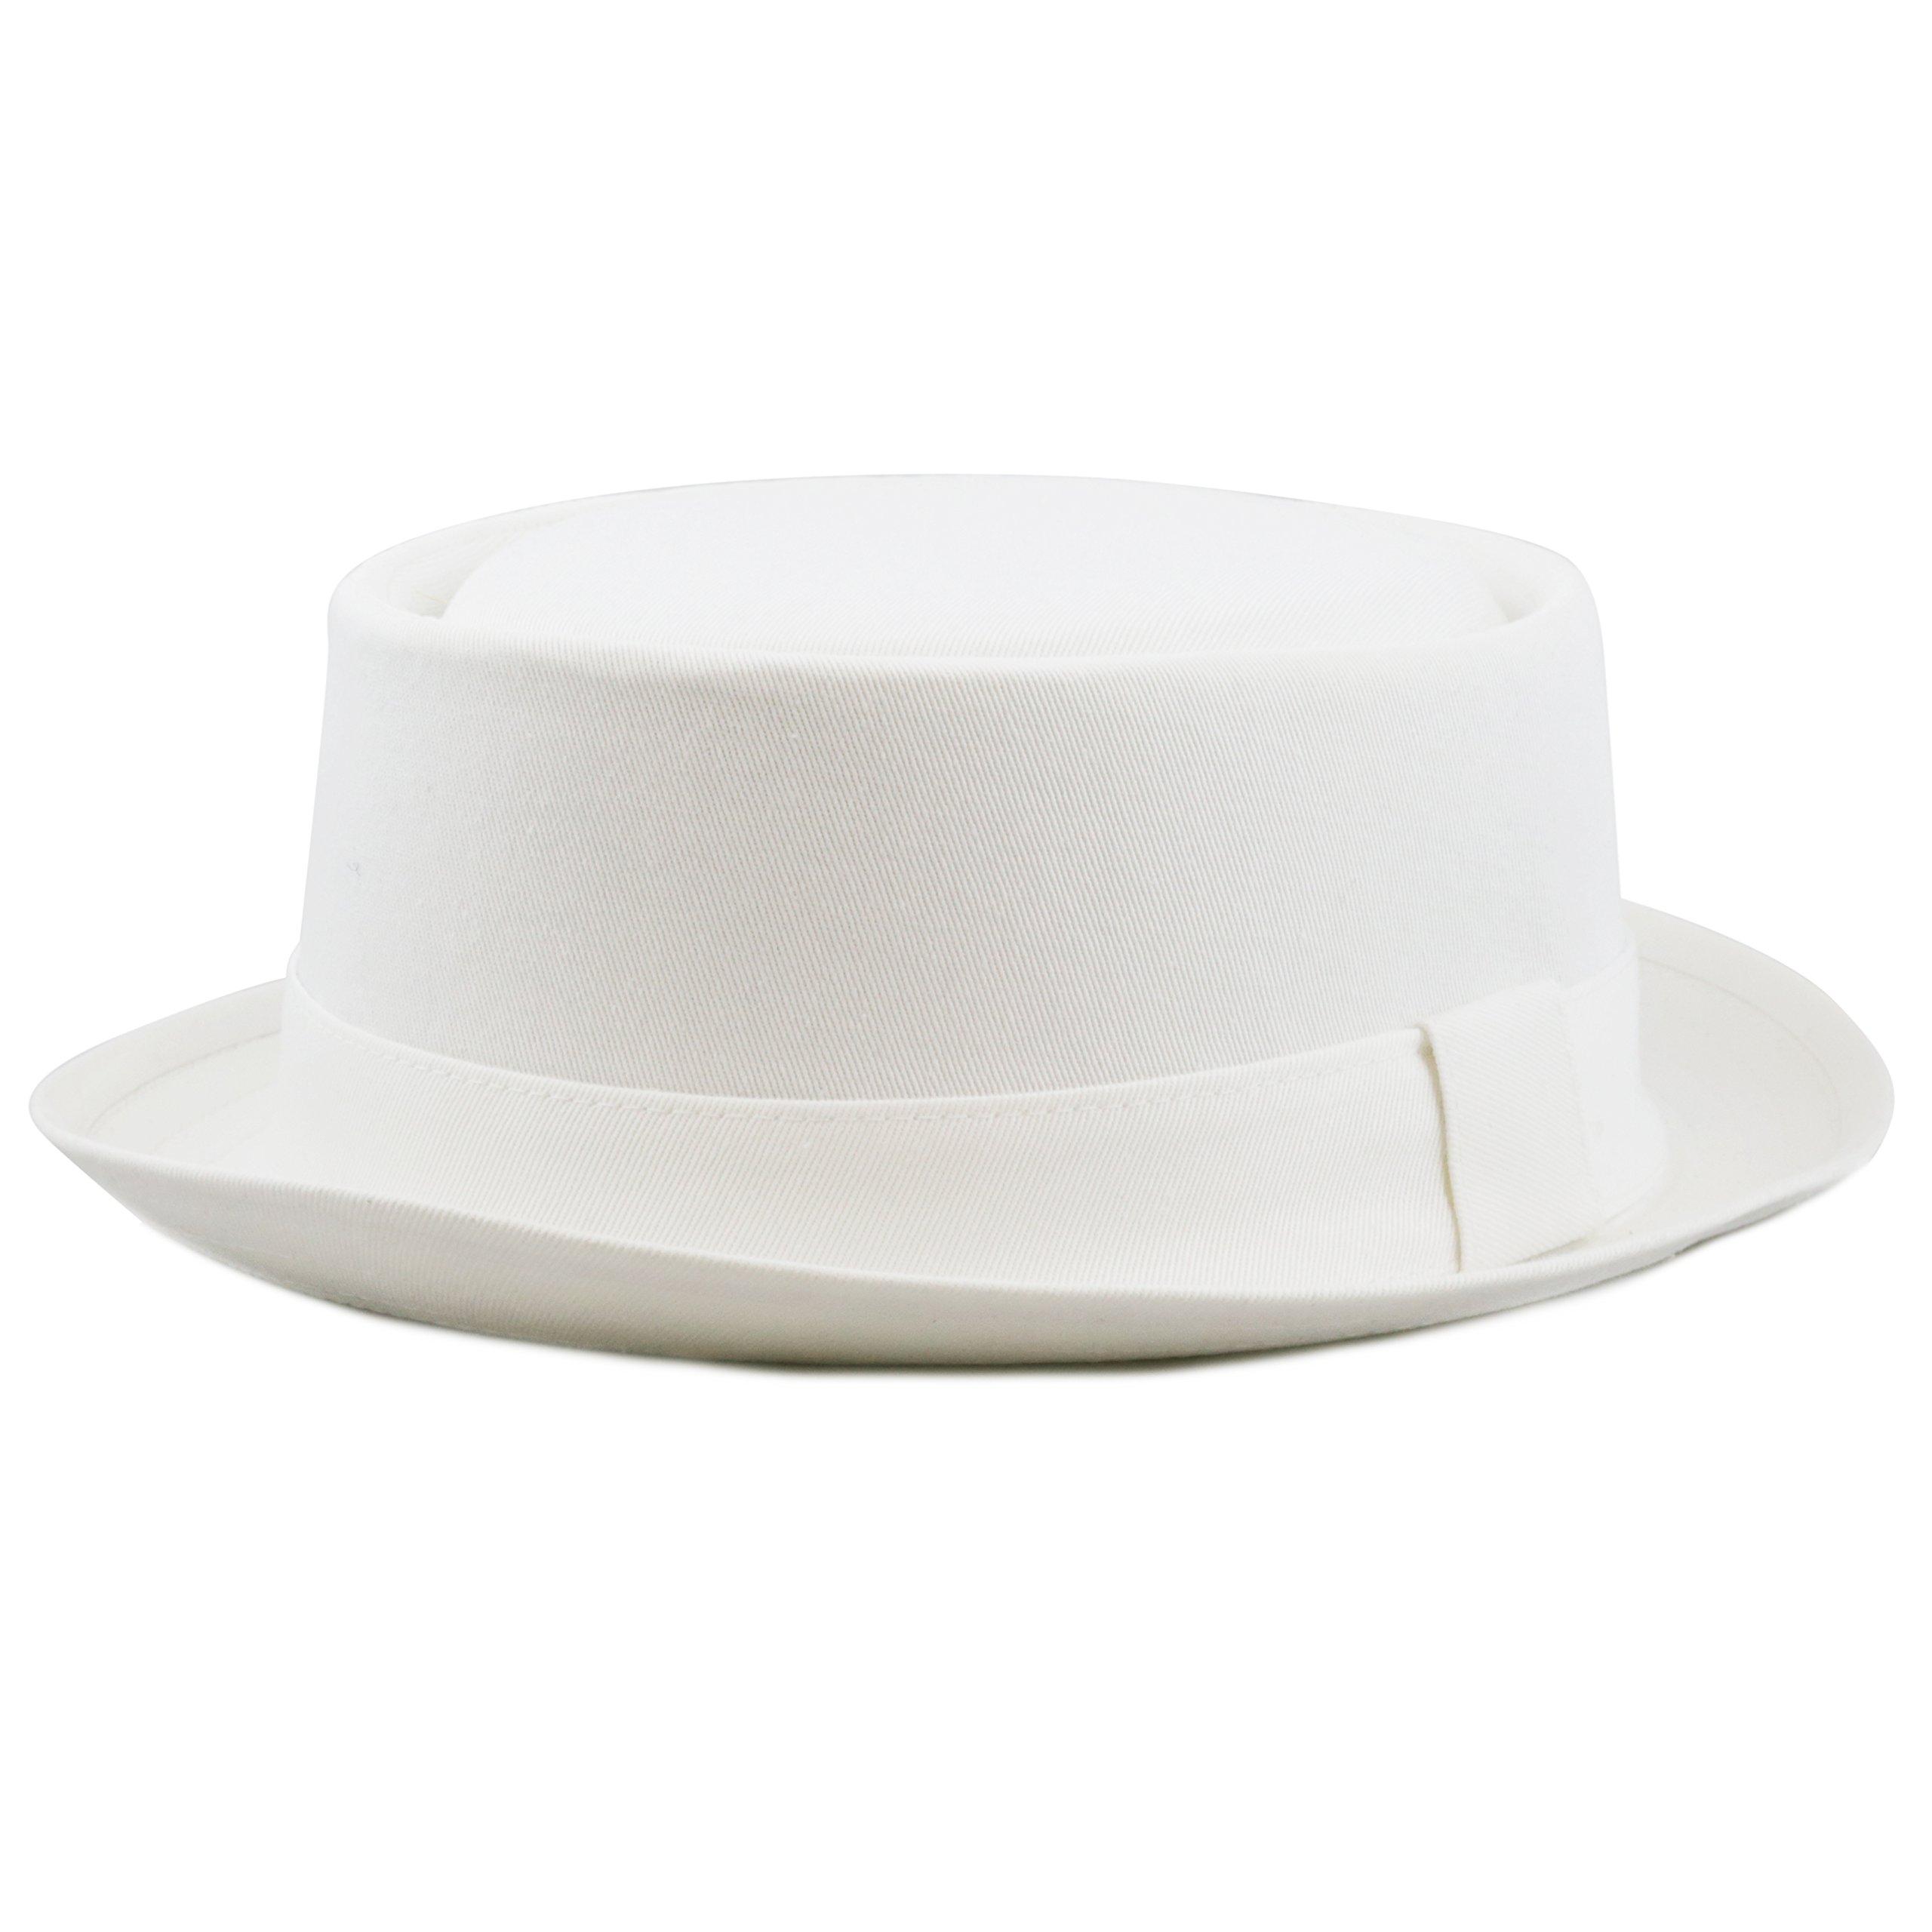 THE HAT DEPOT 1400f2091 100% Cotton Paisley Lining Premium Quality Porkpie Hat (S/M, White)